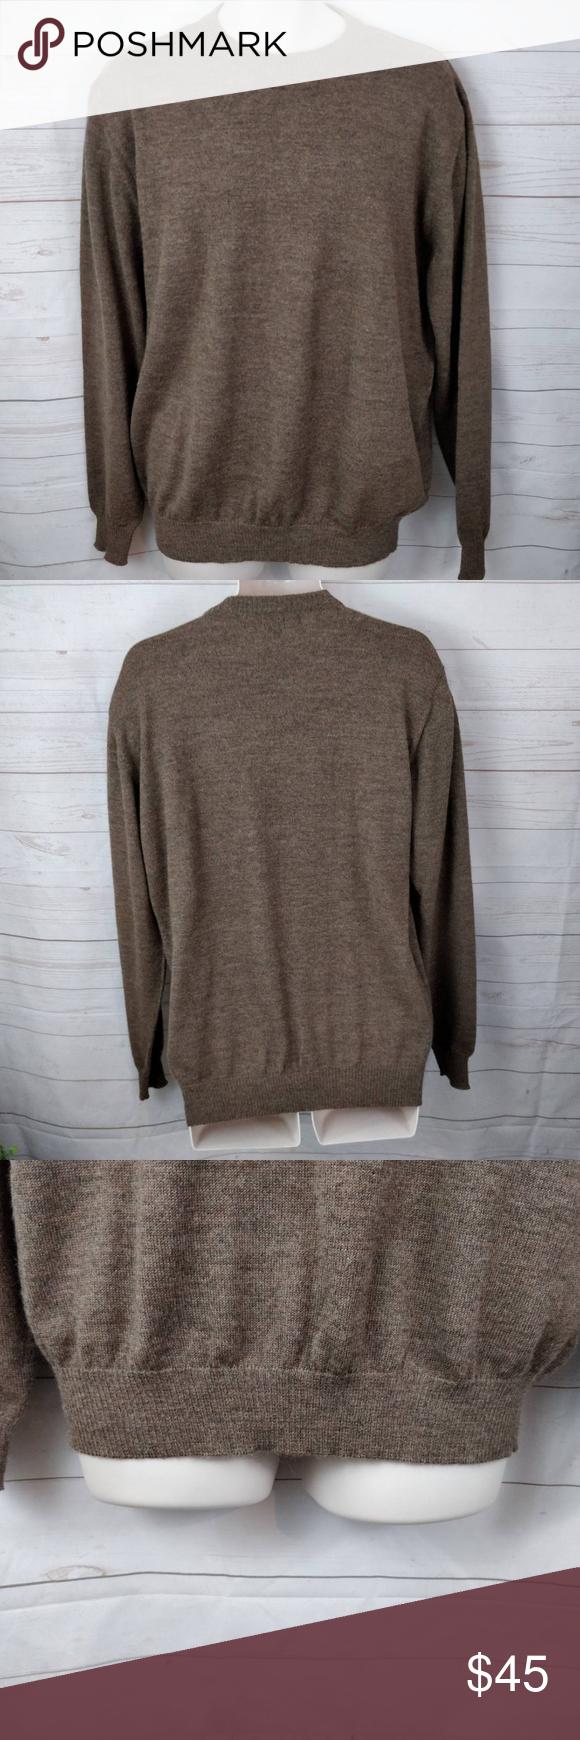 Everything Alpaca 100 Baby Alpaca Sweater Xl Alpaca Sweater Sweaters Clothes Design